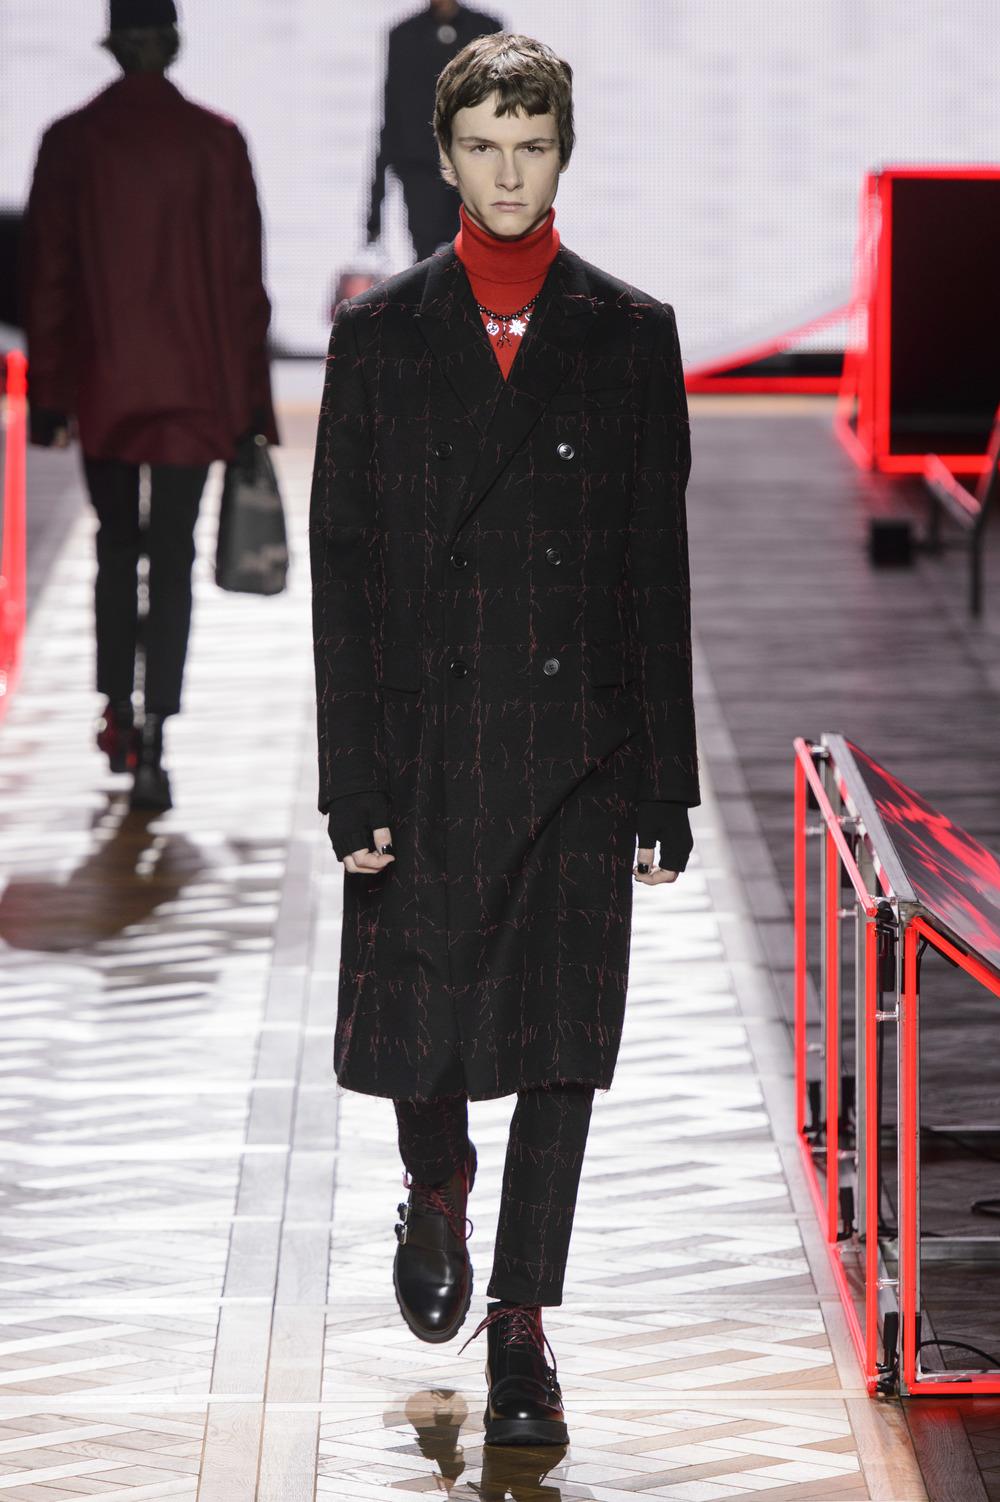 Dior_Homme_Hiver2016-17_look_20.JPG